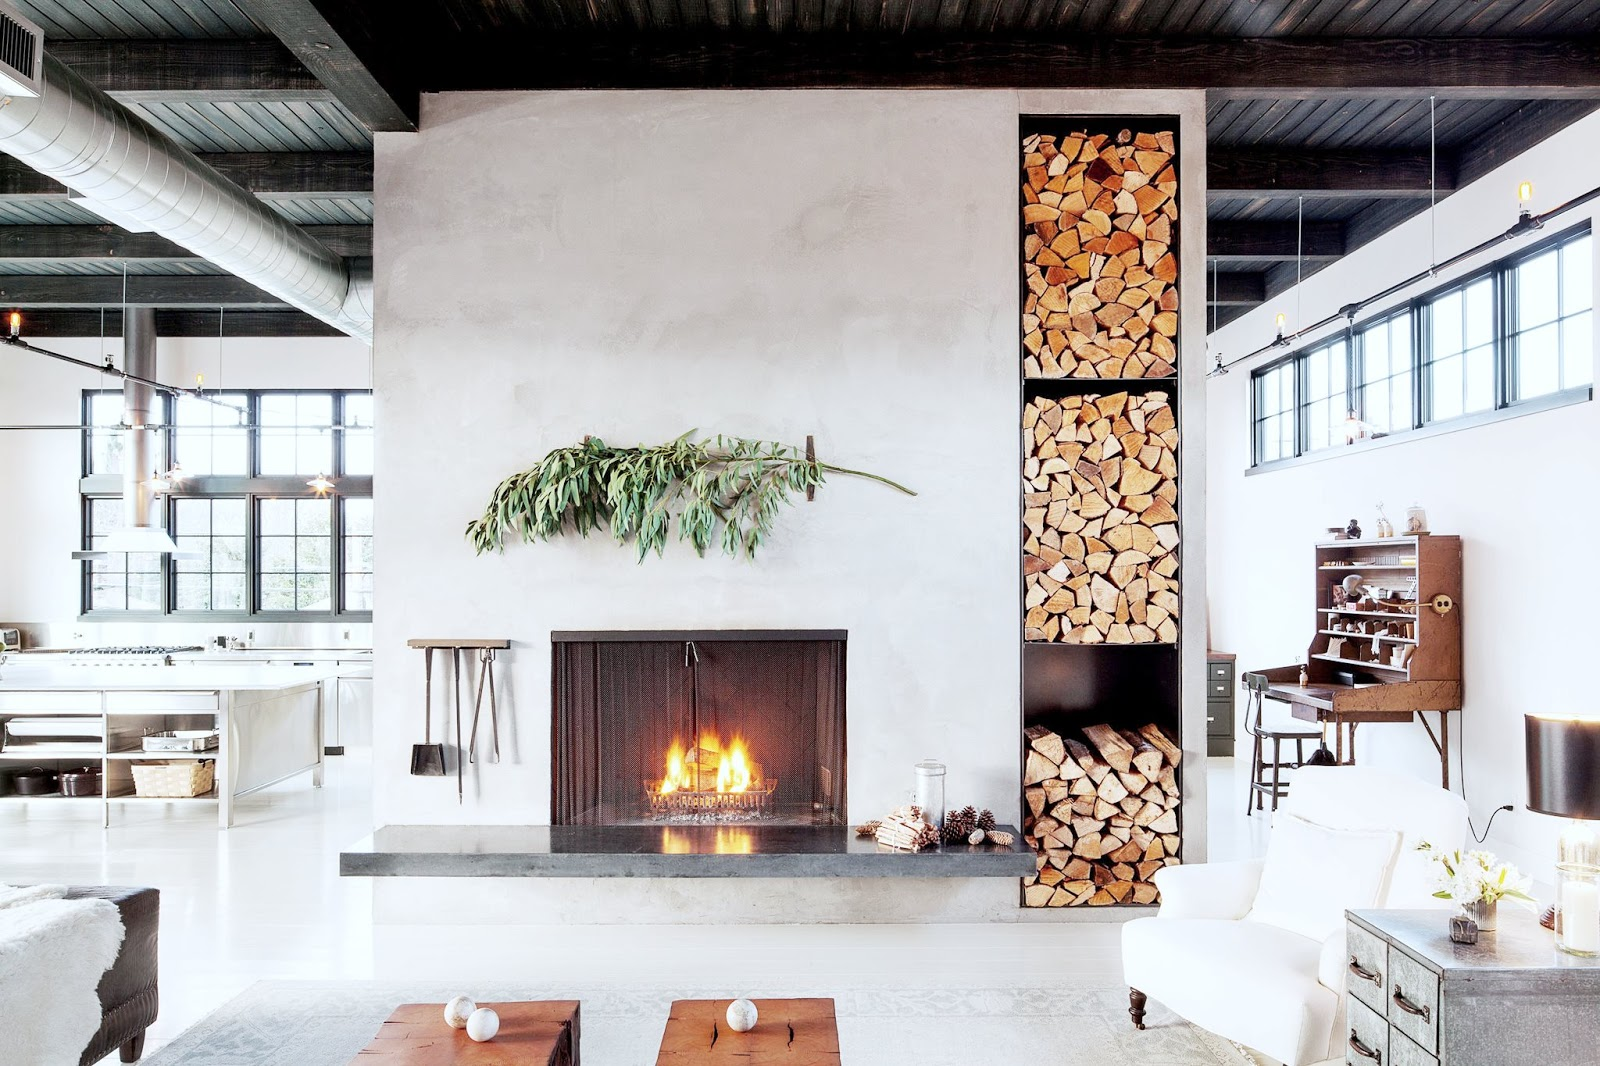 livingroomfireplaceindustrialloftcococozynyt  COCOCOZY